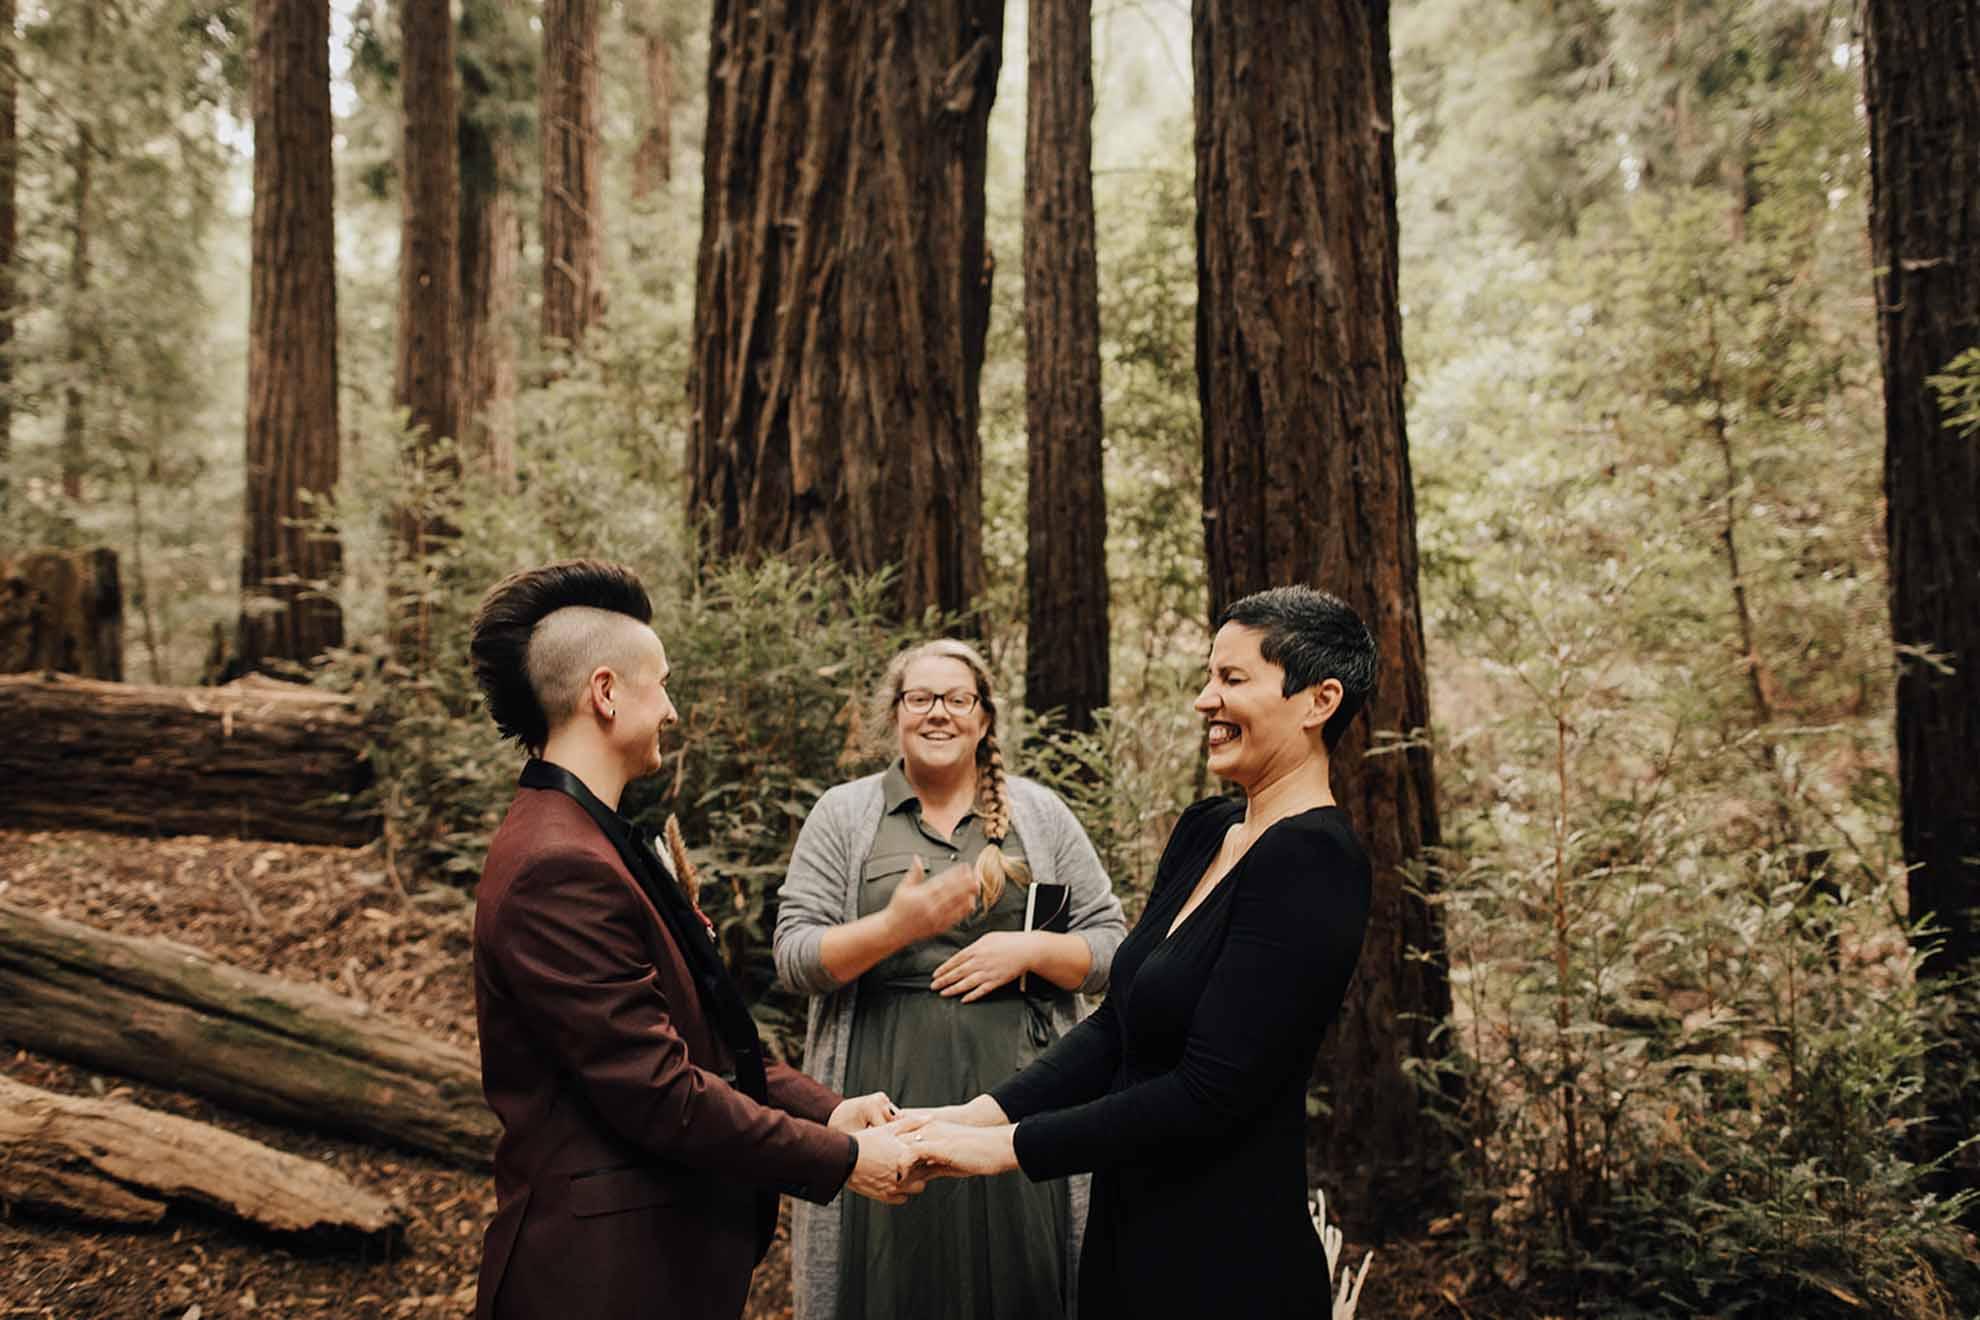 Evynn LeValley Big Sur California lesbian gay lgbtq+ vow renewal elopement Dancing With Her worldwide magazine